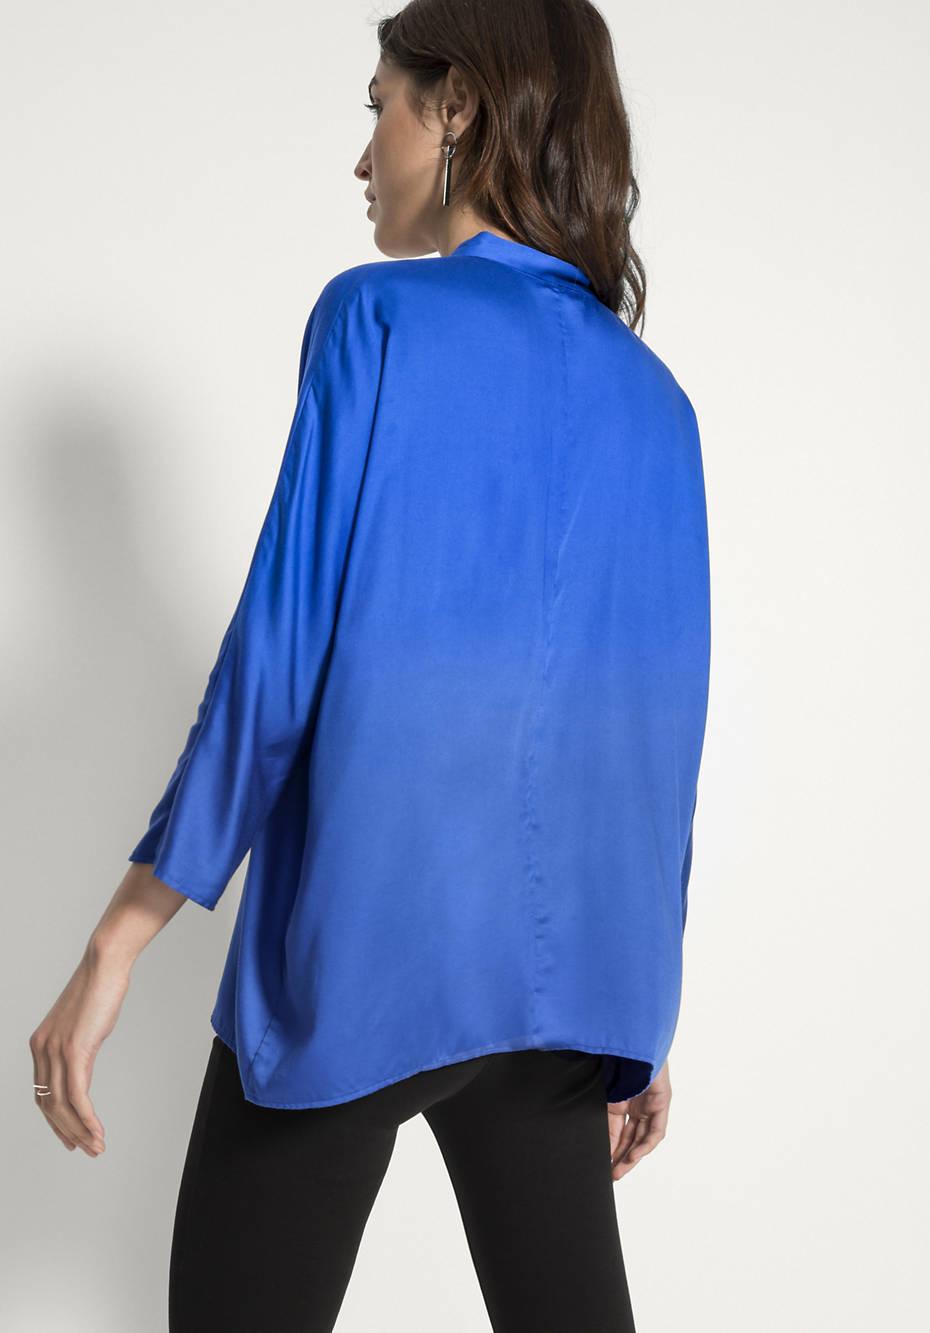 Bluse aus reinem Modal